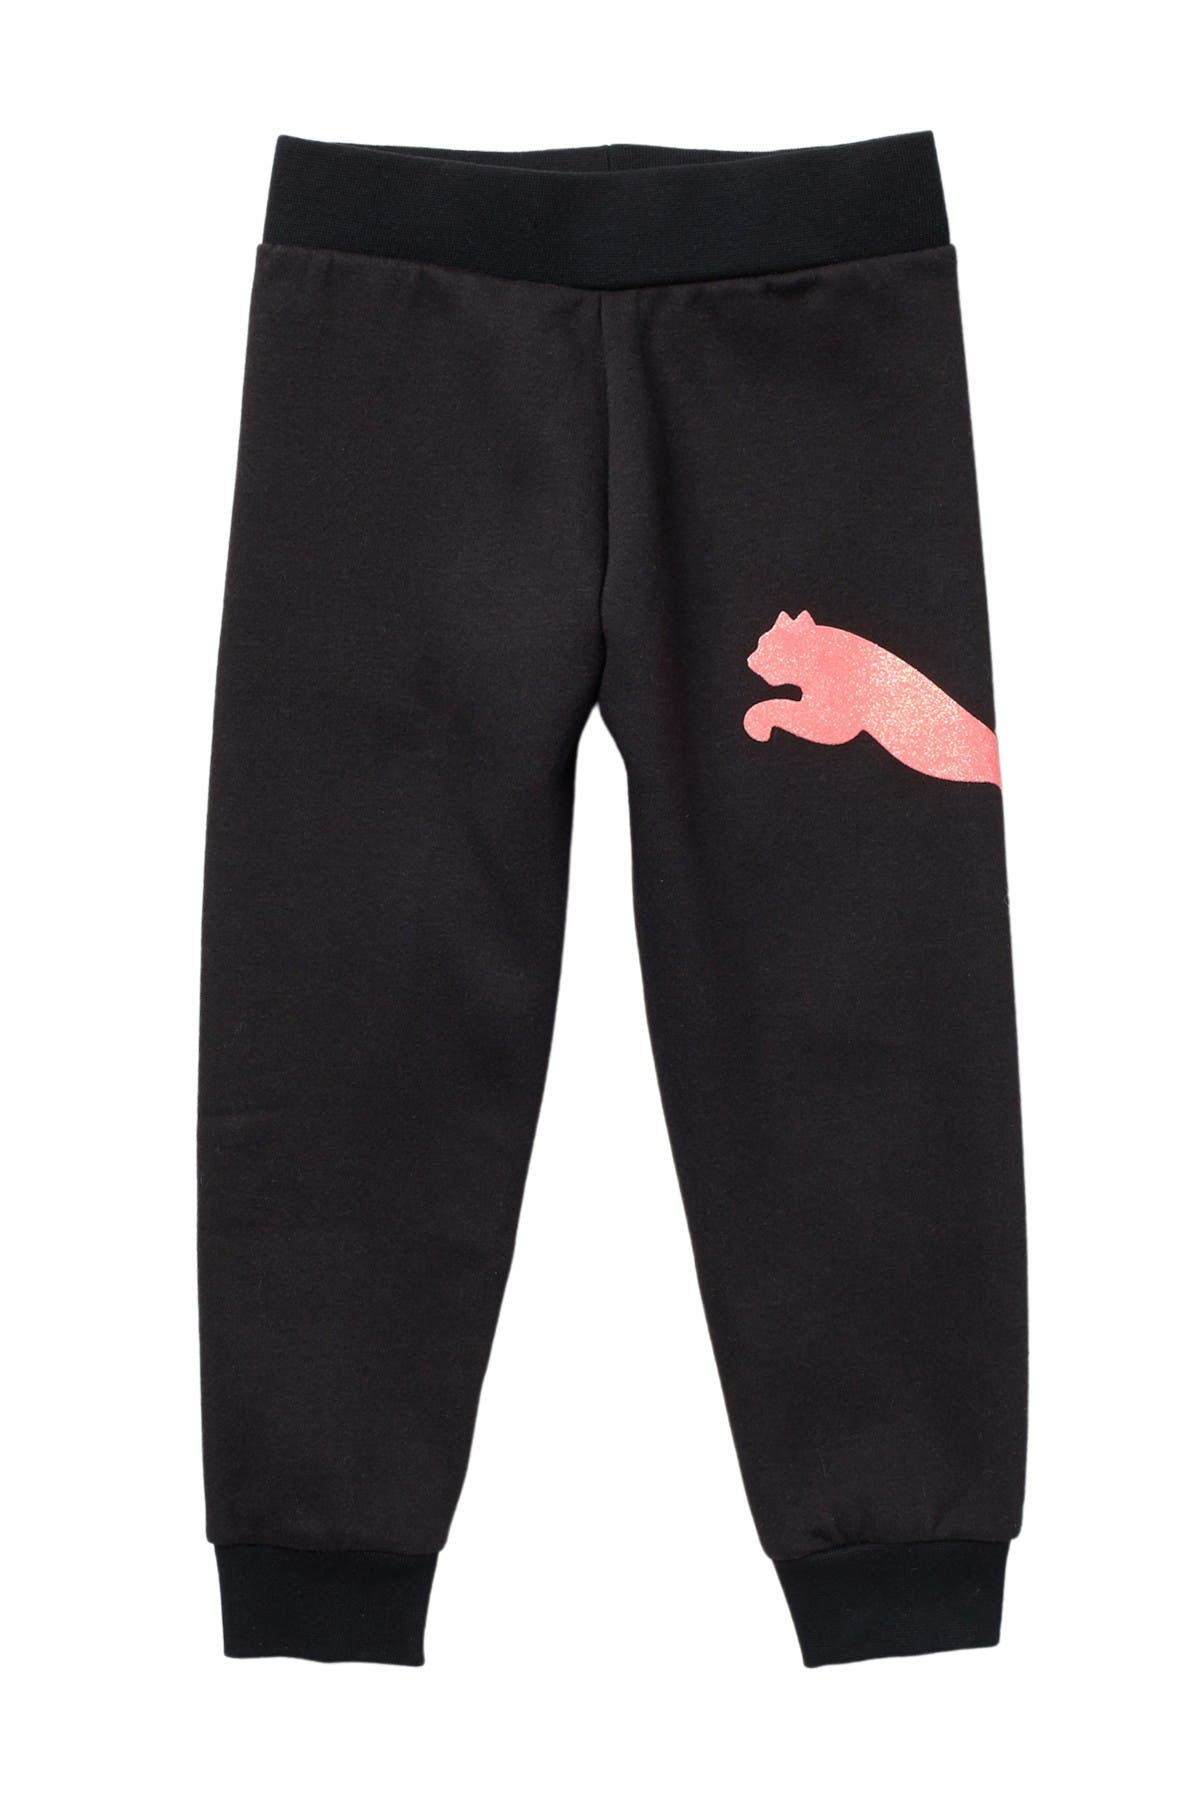 Image of PUMA Be Bold Fleece Joggers